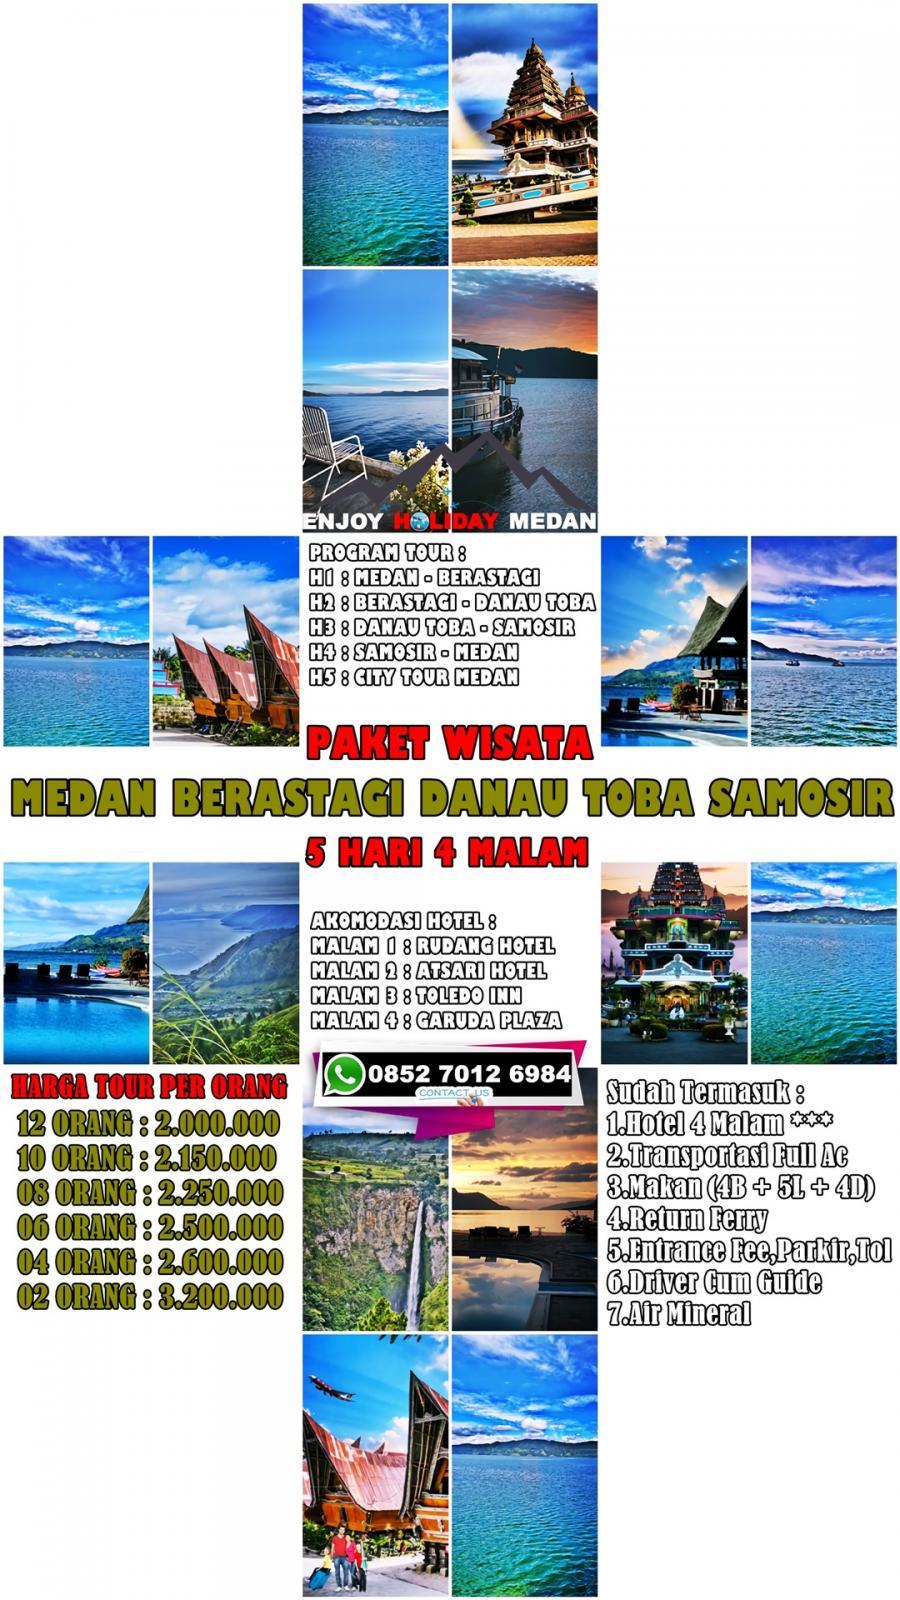 5H4M Ziarek Tour Rohani Medan Danau Toba